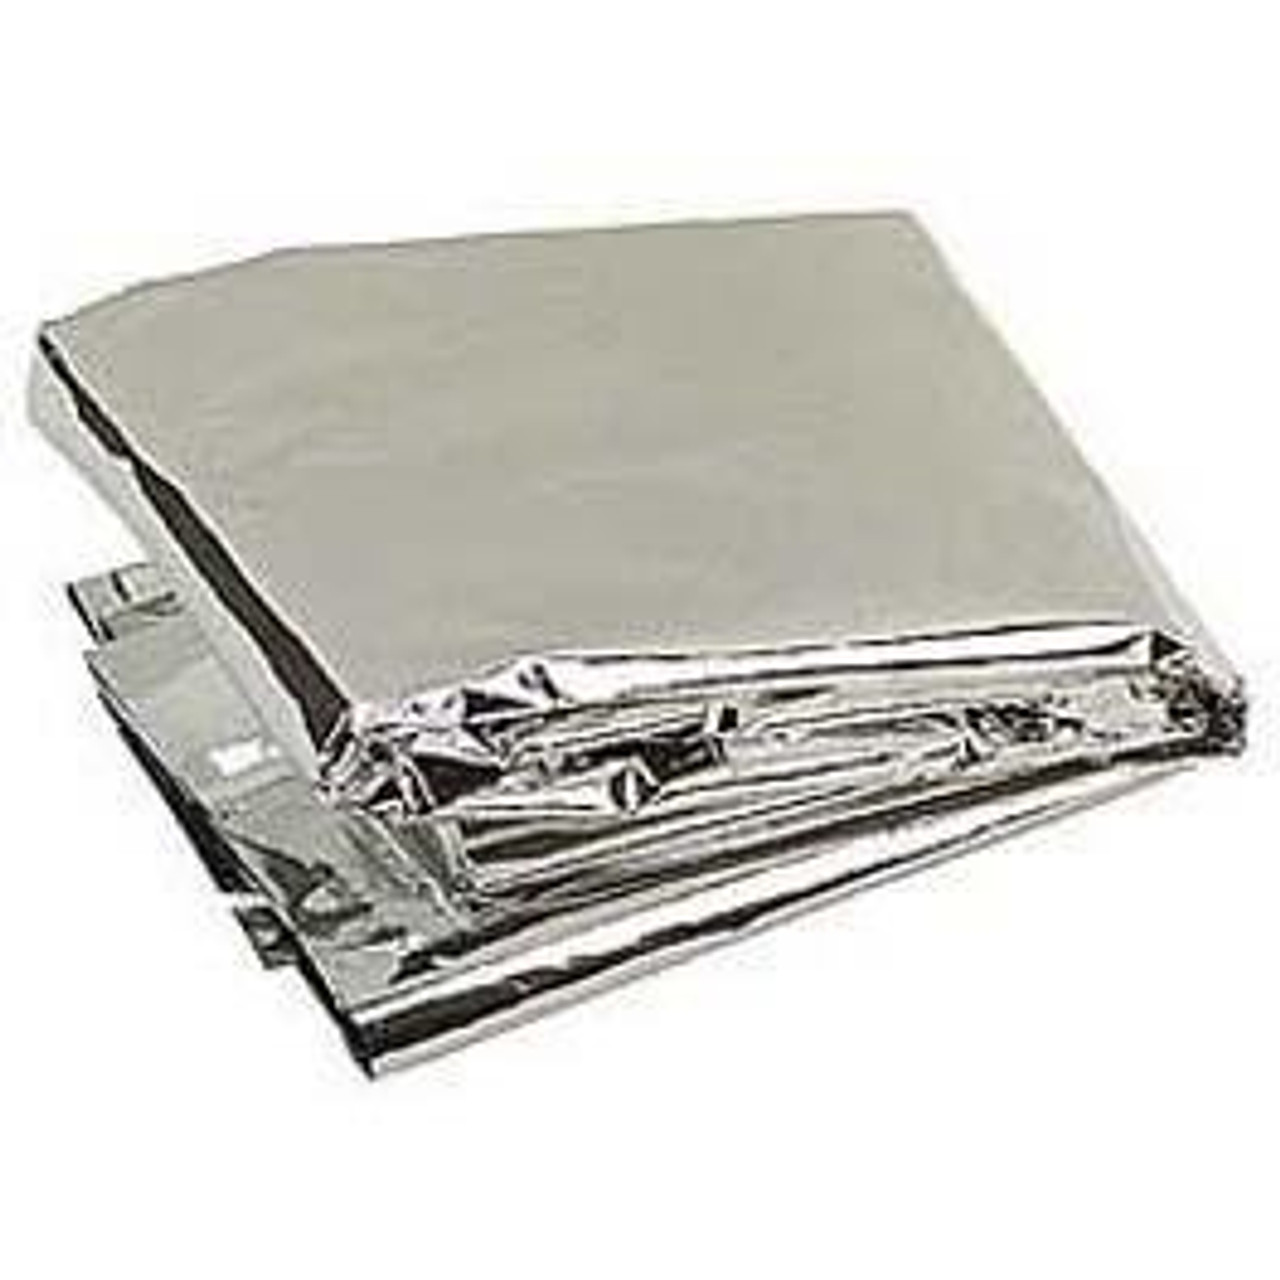 Thermal Emergency Blanket - Silver - 250 case